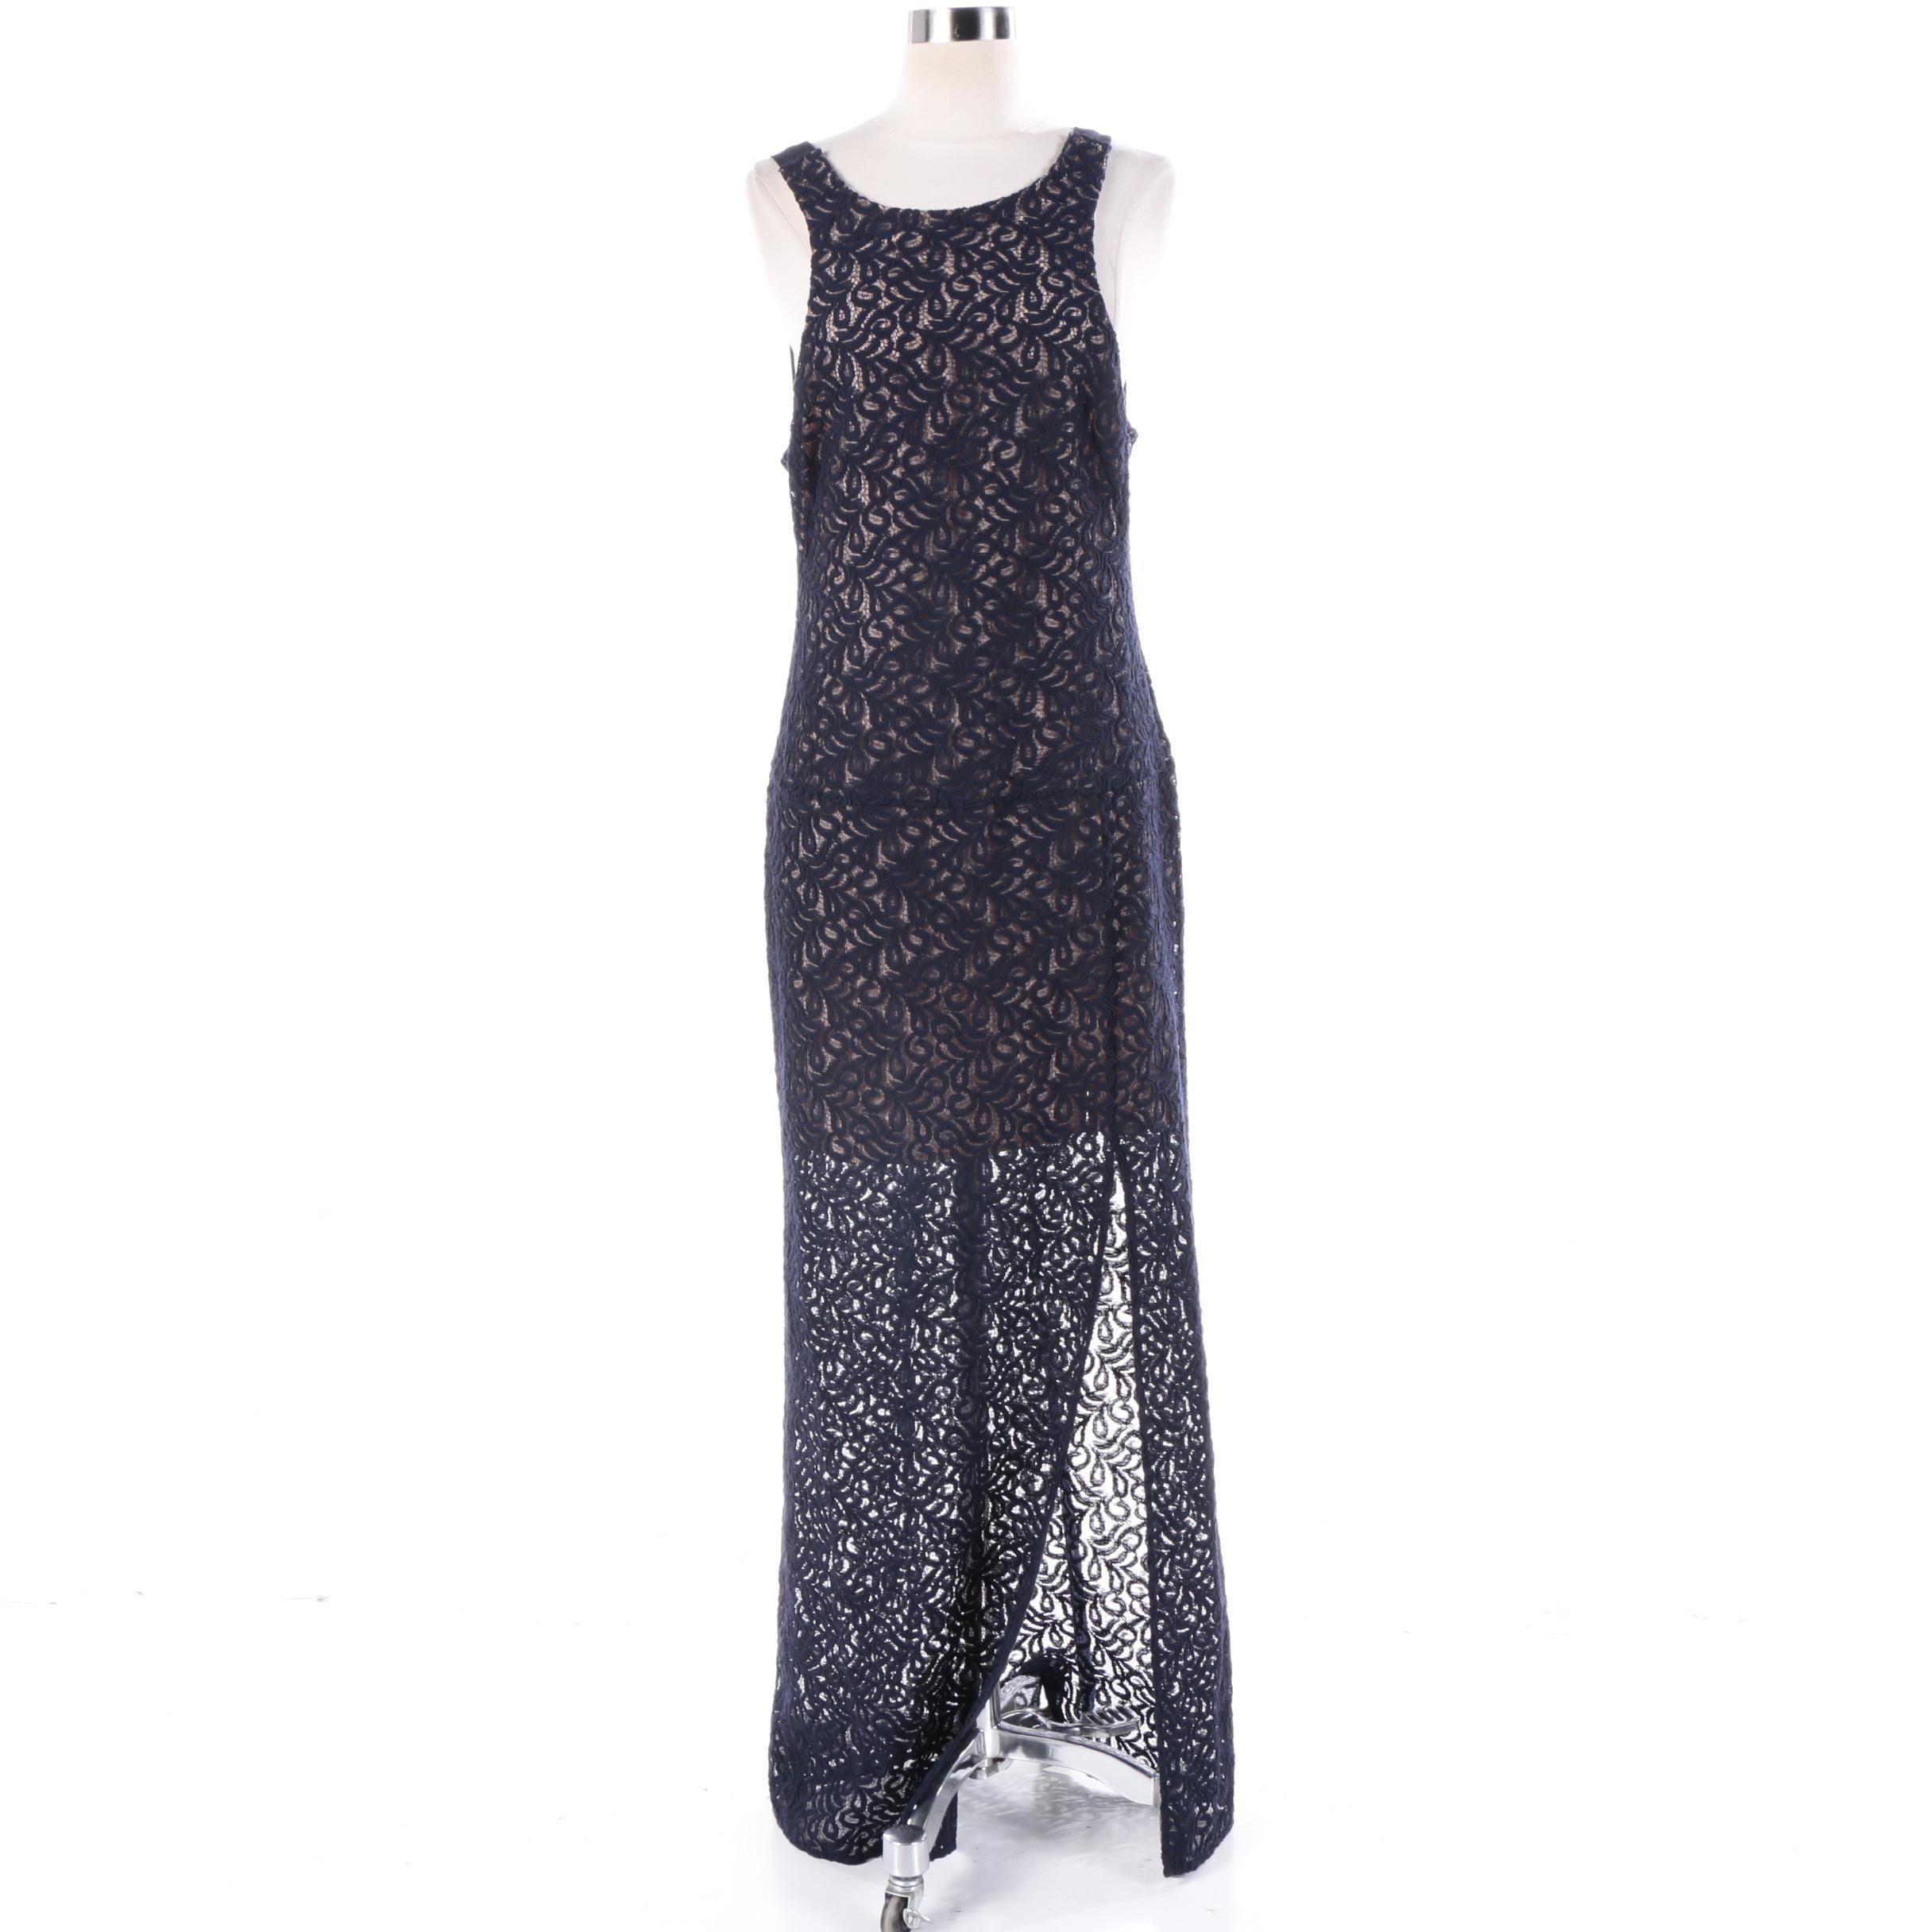 Free People Deep Indigo Lace Mesh Sleeveless Dress